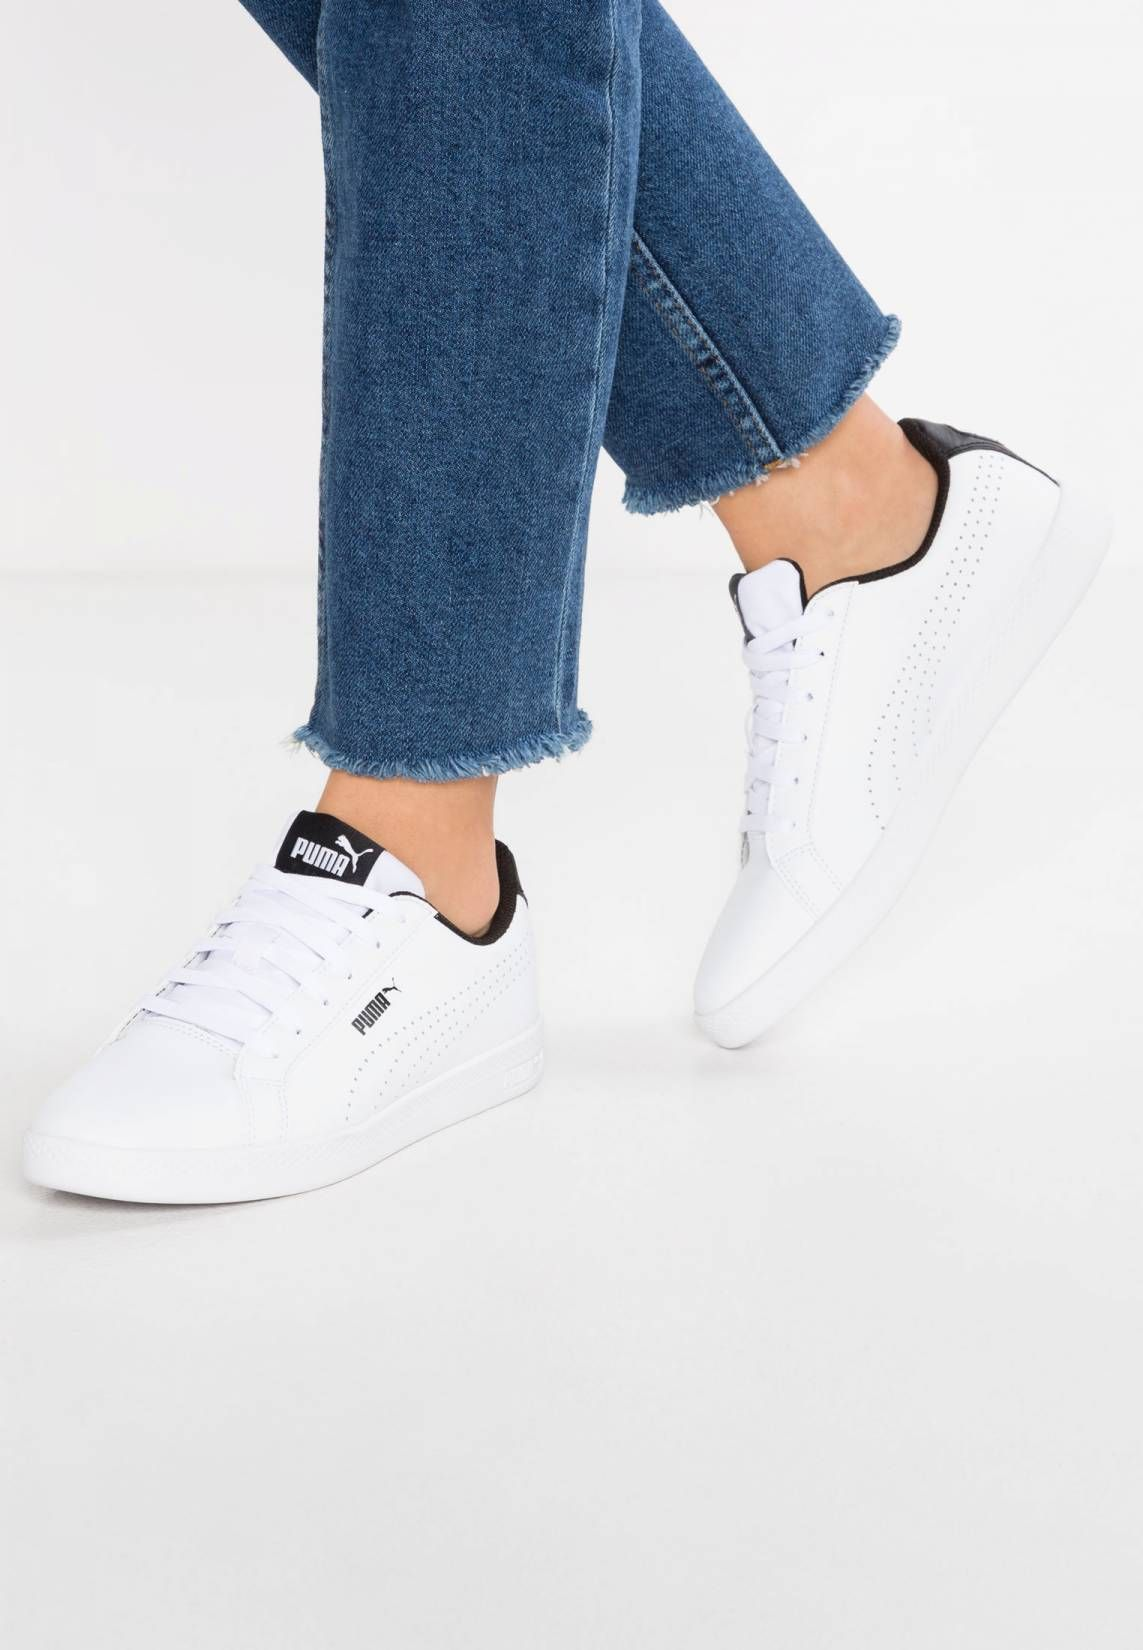 29 ideas sneakers damen 2018 puma #sneakers | Sneakers, Puma